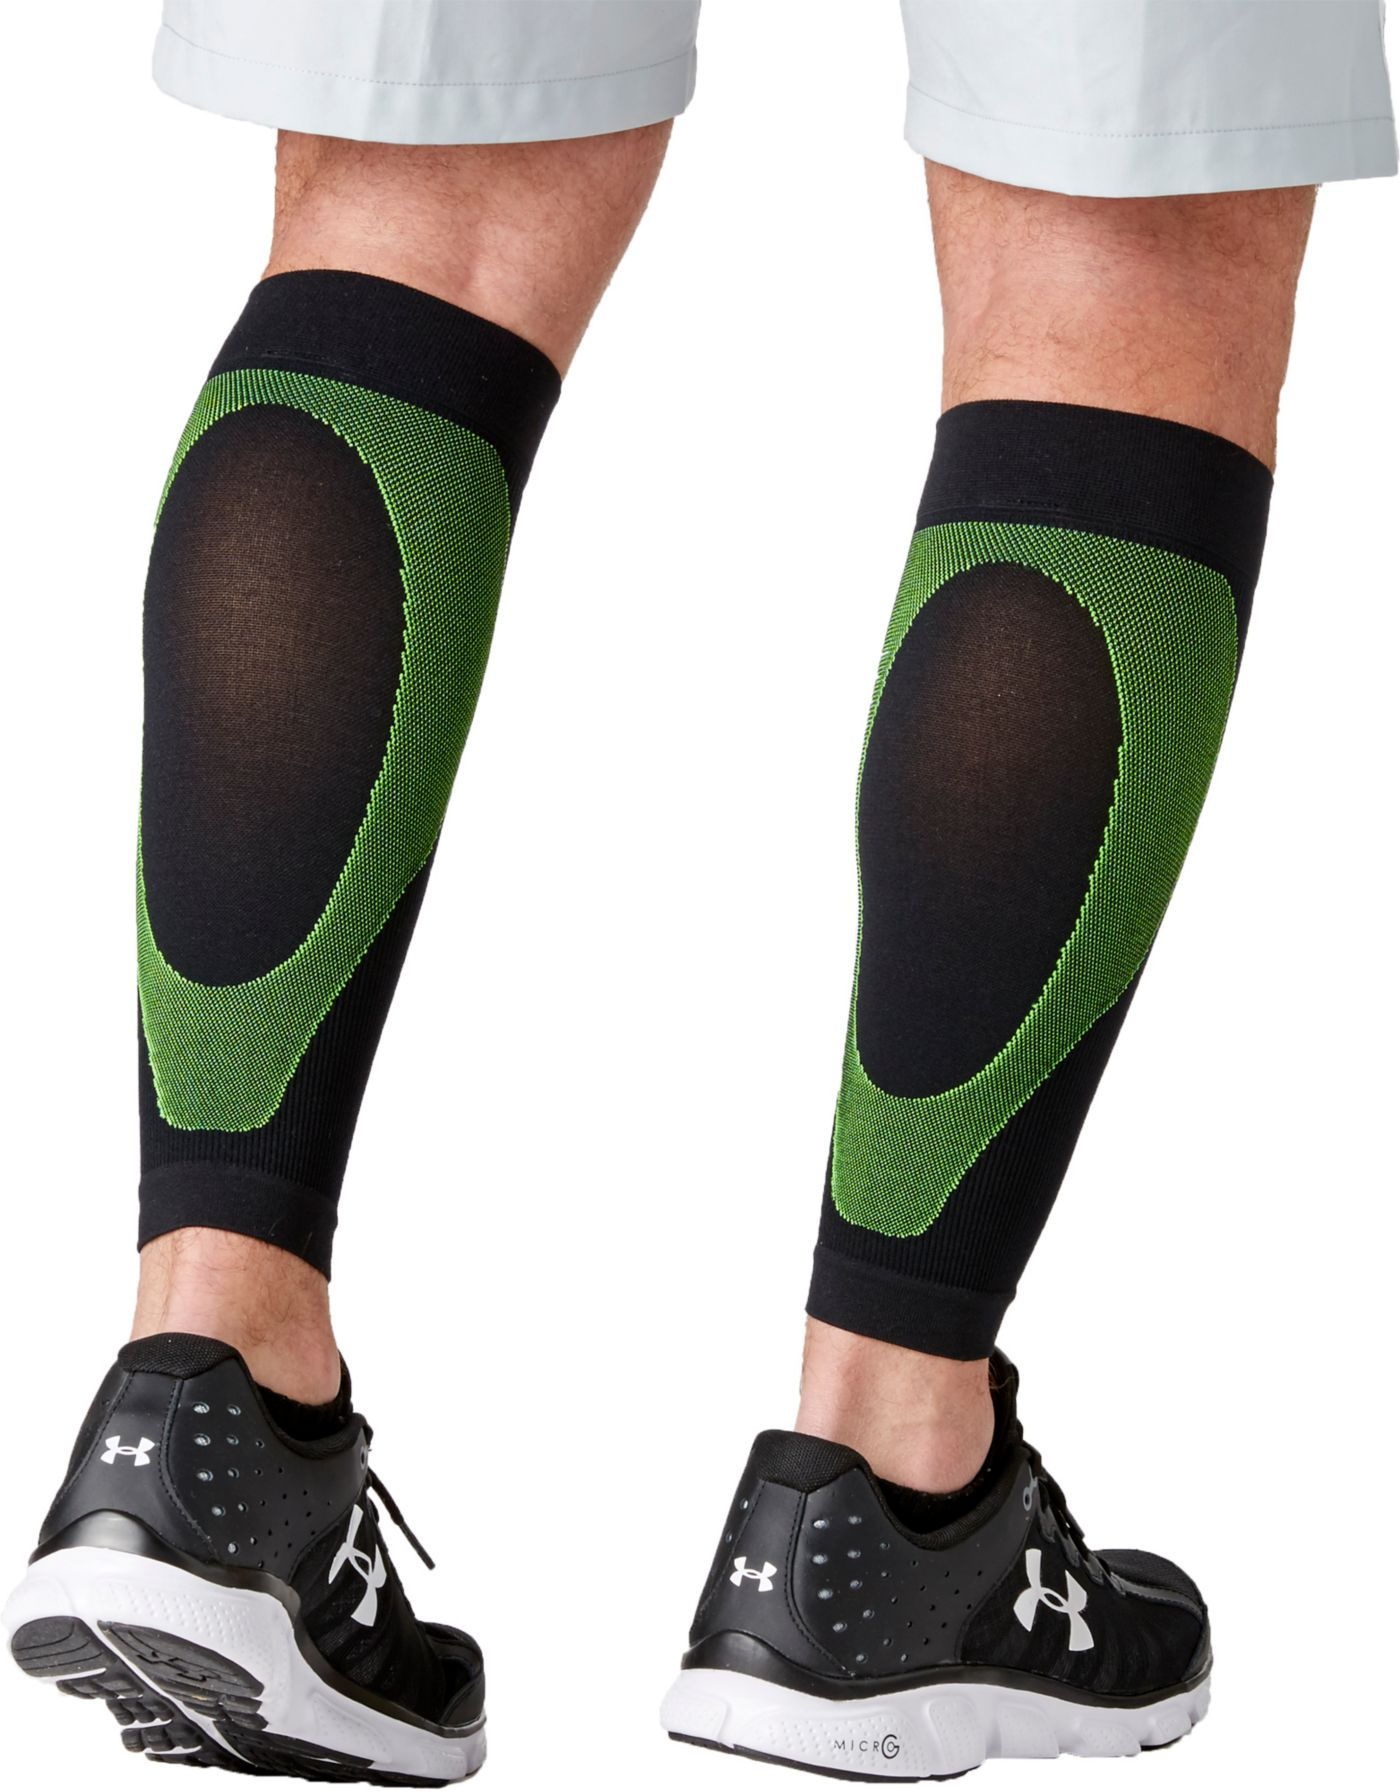 P-TEX Knit Compression Calf Sleeves